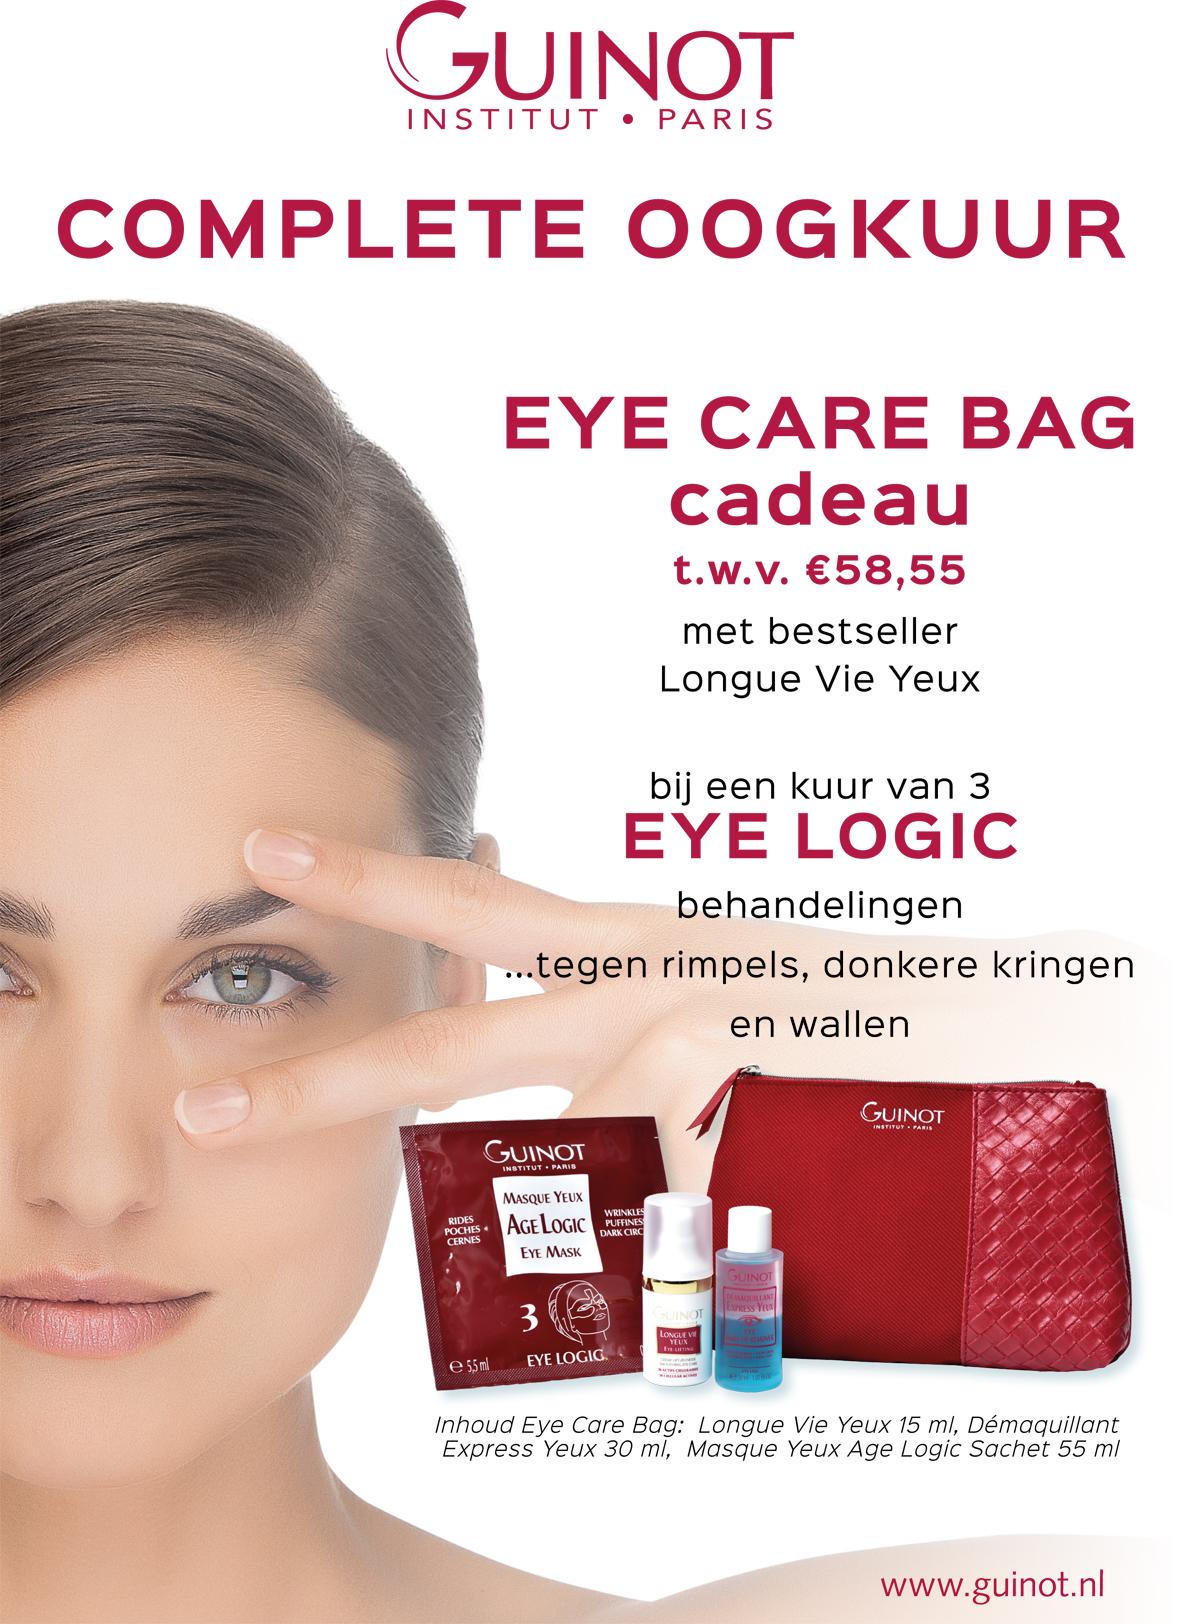 Schoonheidssalon Farida - Eye Logic Behandeling